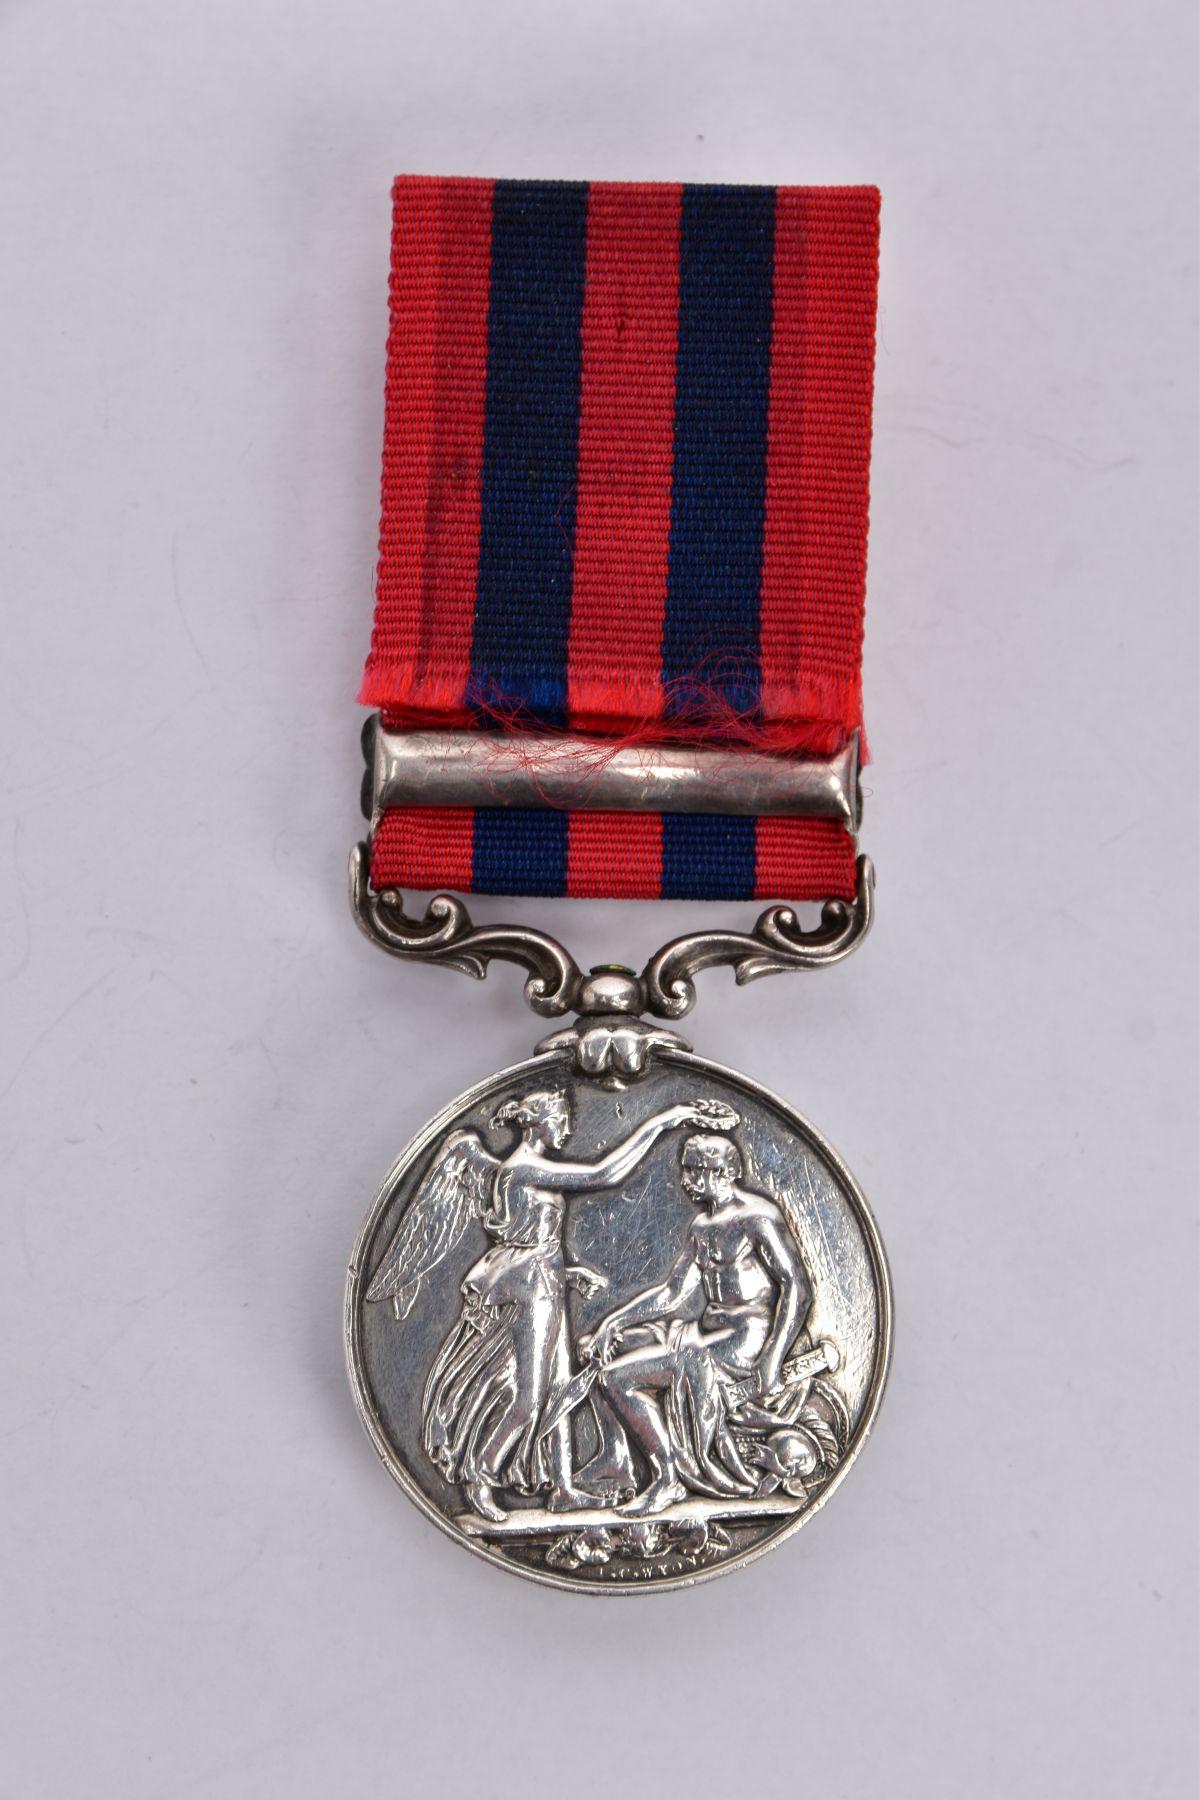 INDIA GENERAL SERVICE MEDAL 1854, Bar Pegu, named on rim John Haniin 51st K.C.Lt Infantry - Image 3 of 8